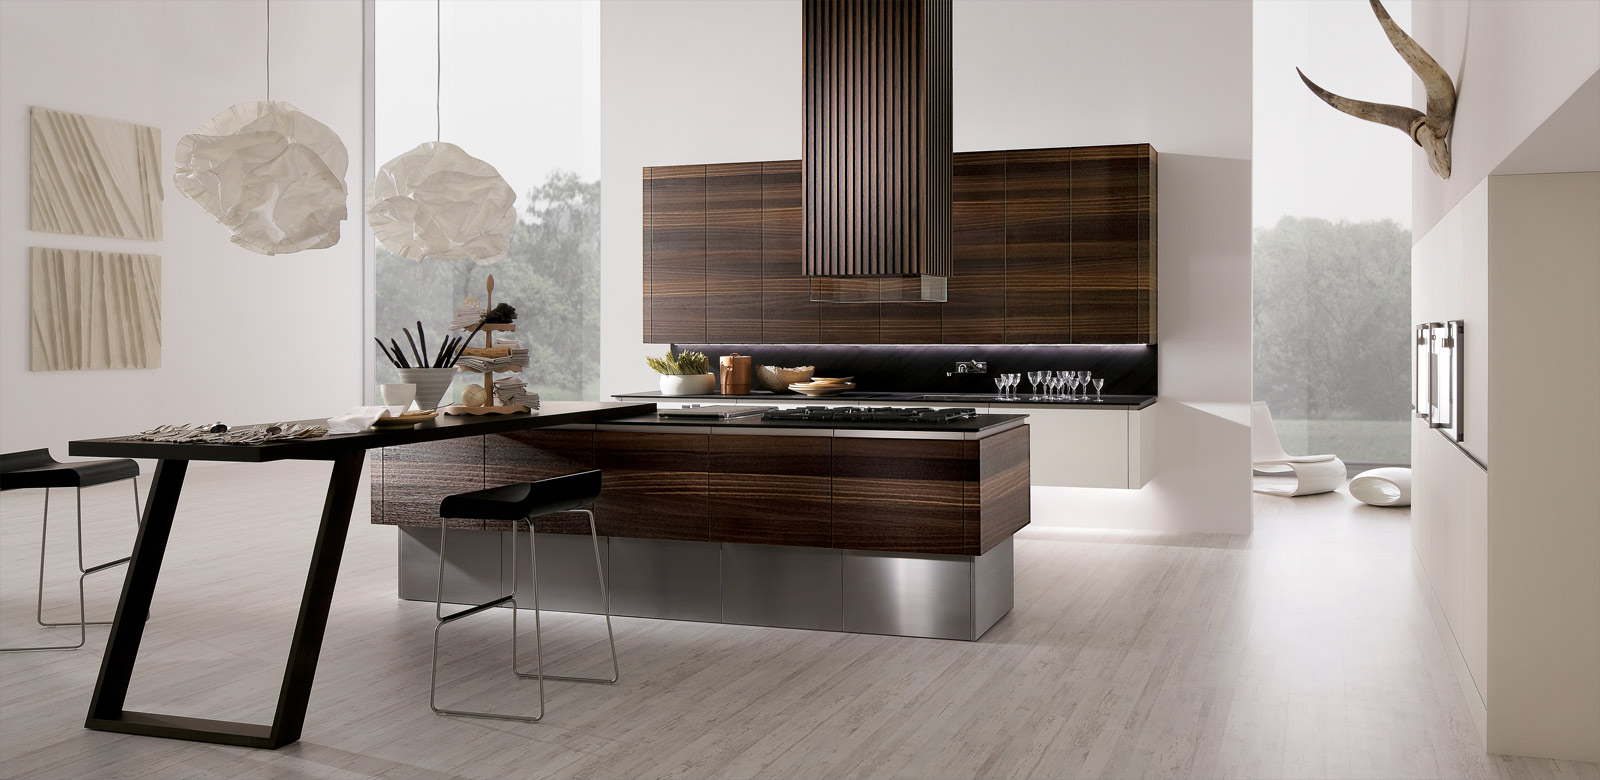 leugers - küchen   innenausbau - home